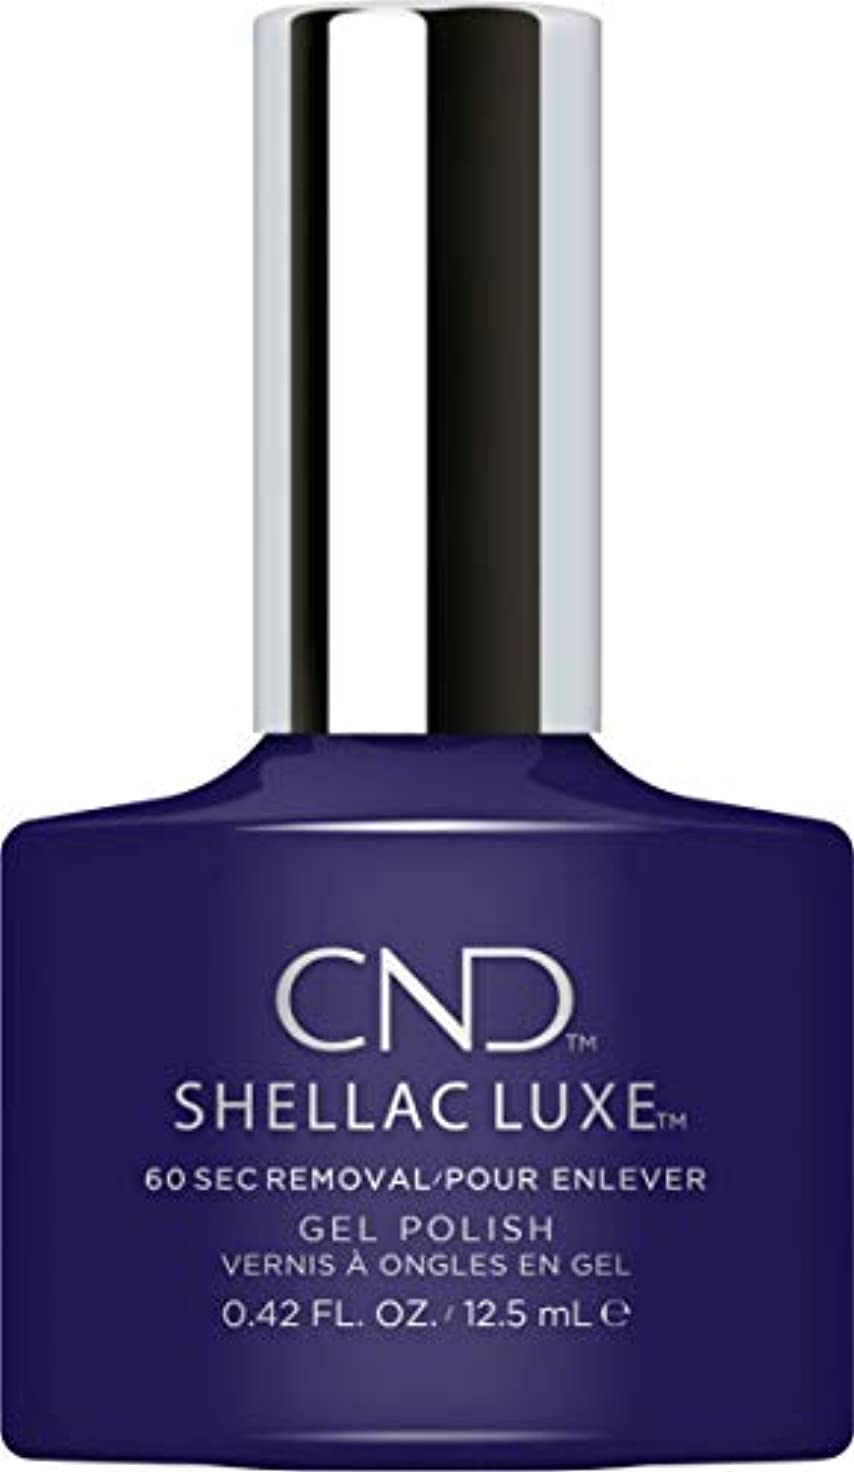 脱走食器棚ショットCND Shellac Luxe - Eternal Midnight - 12.5 ml / 0.42 oz